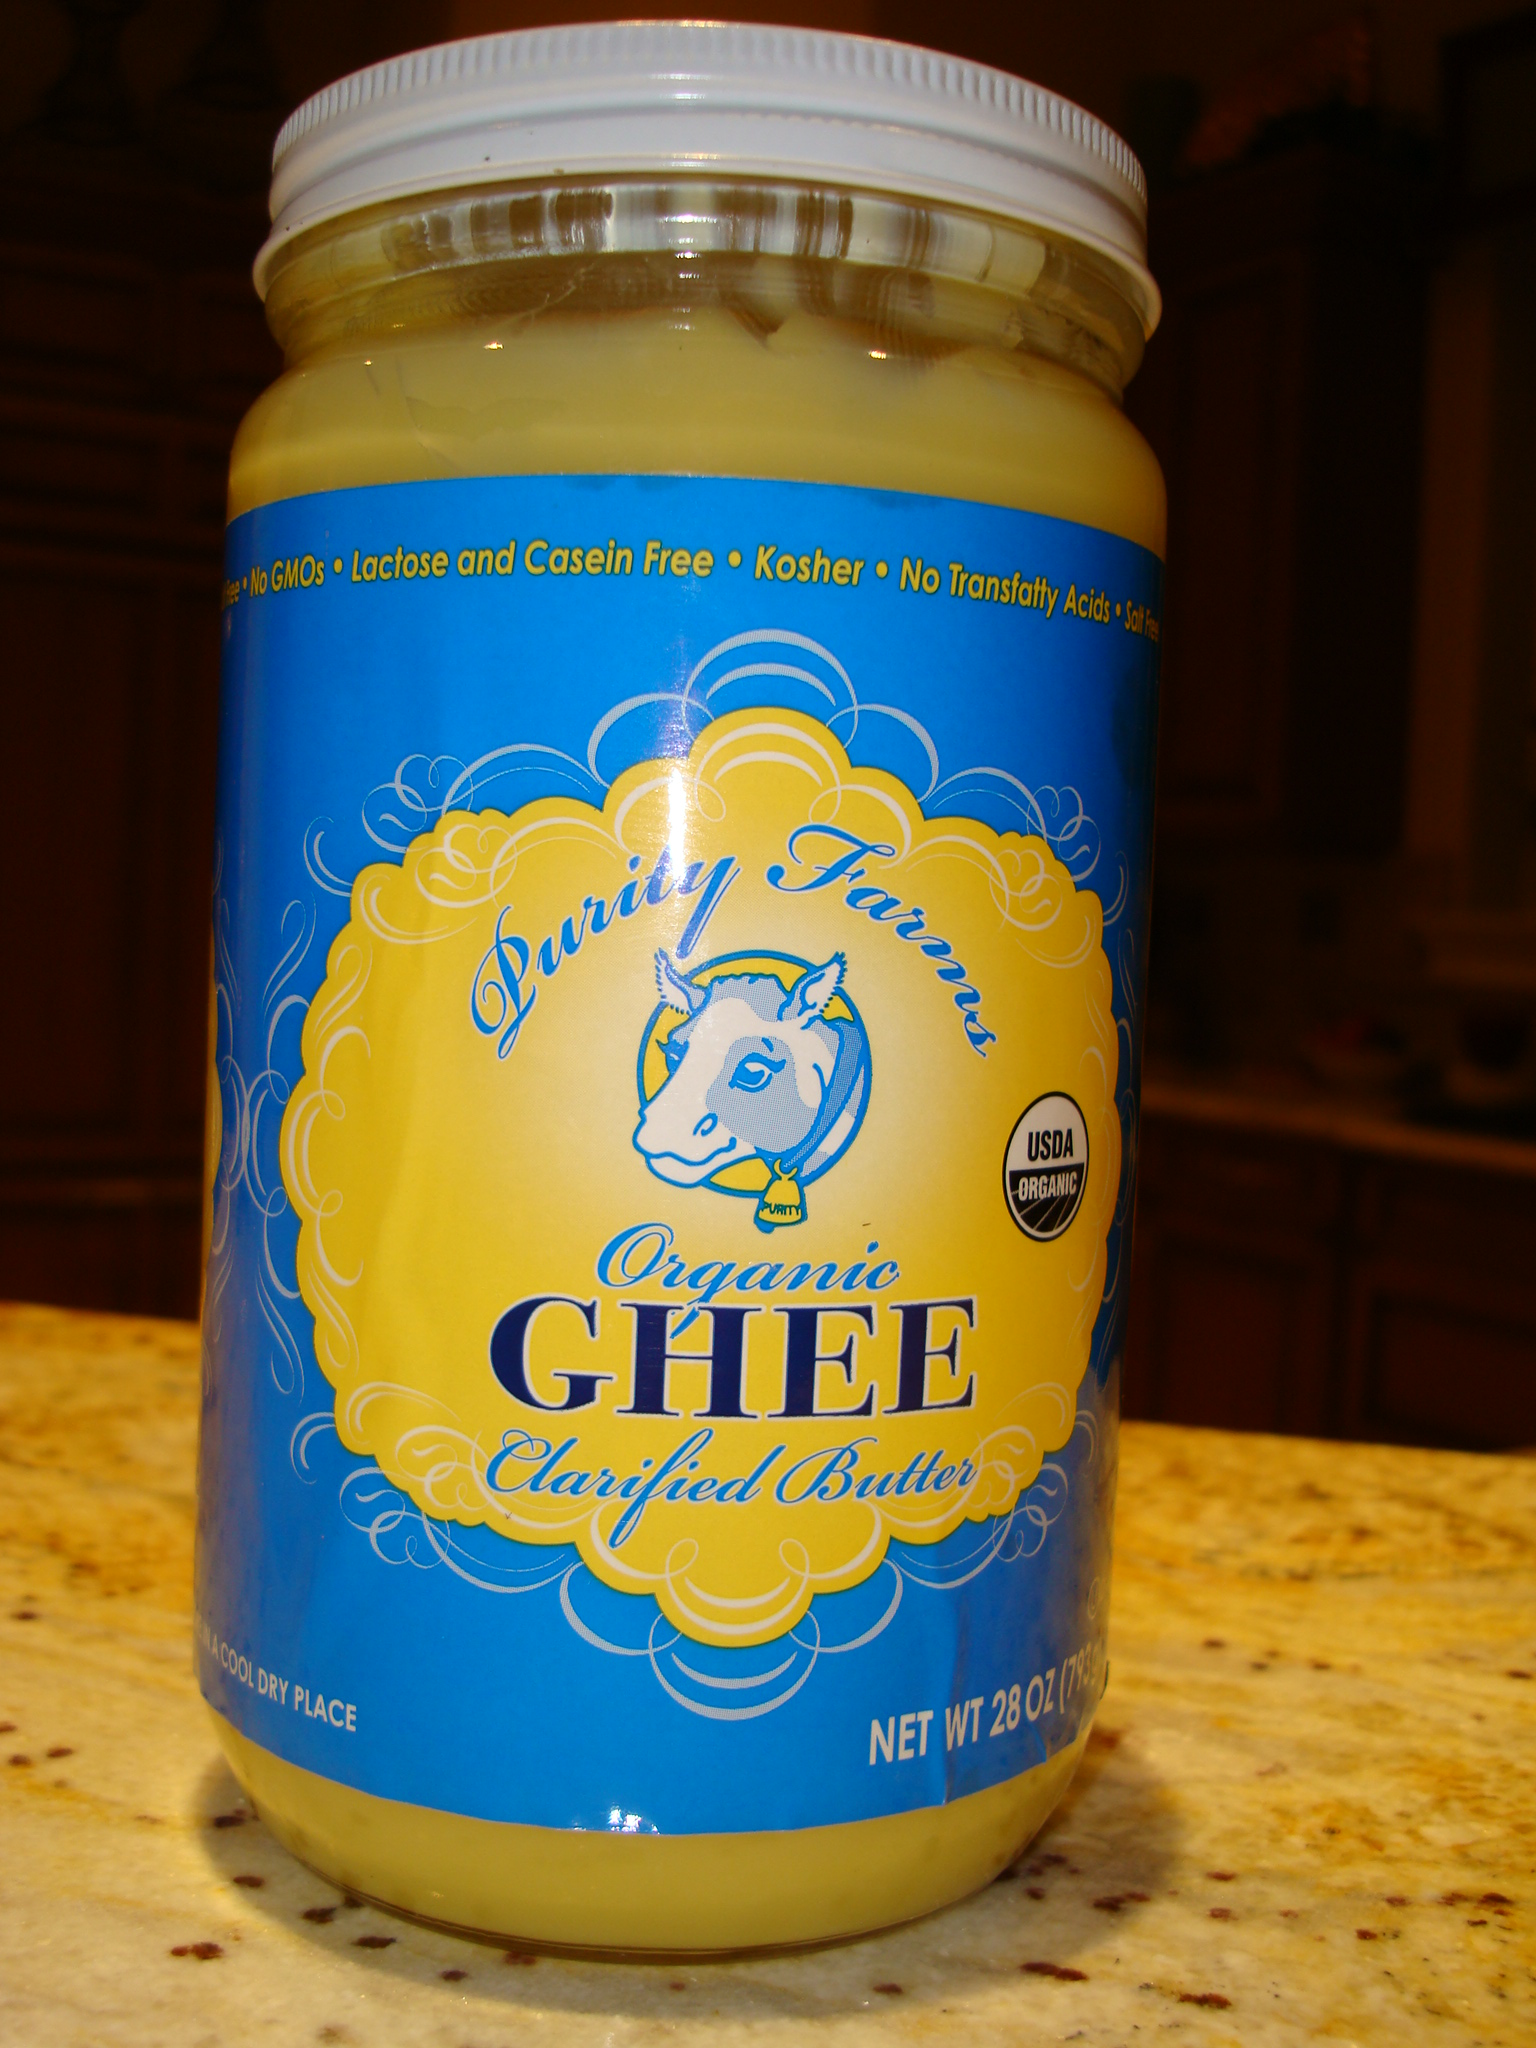 GHEE...a great tastingt butter substitute